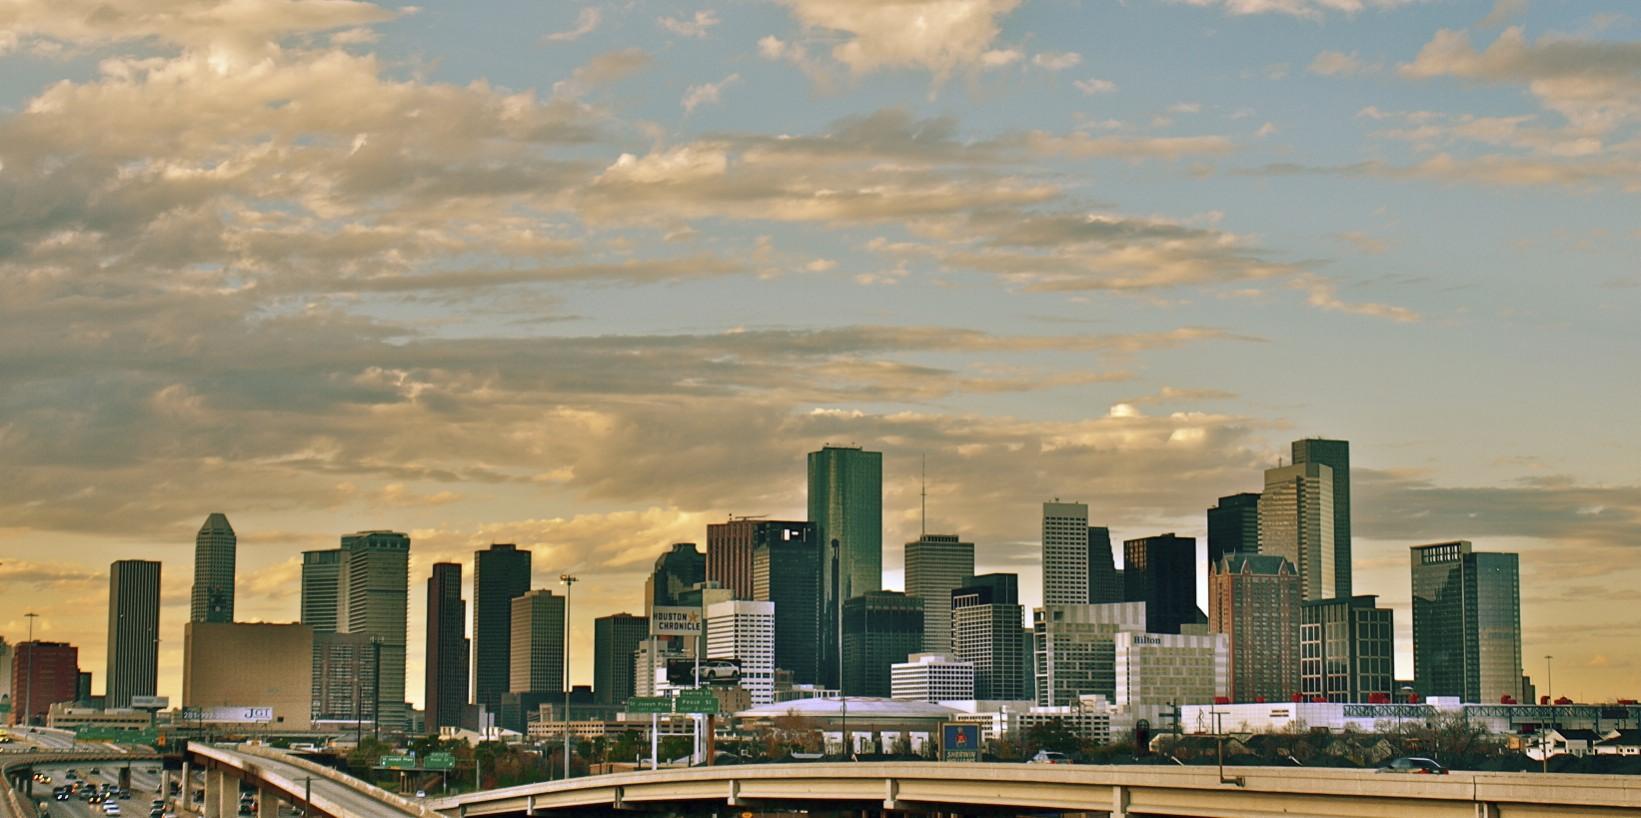 Houston's skyline in 2011.